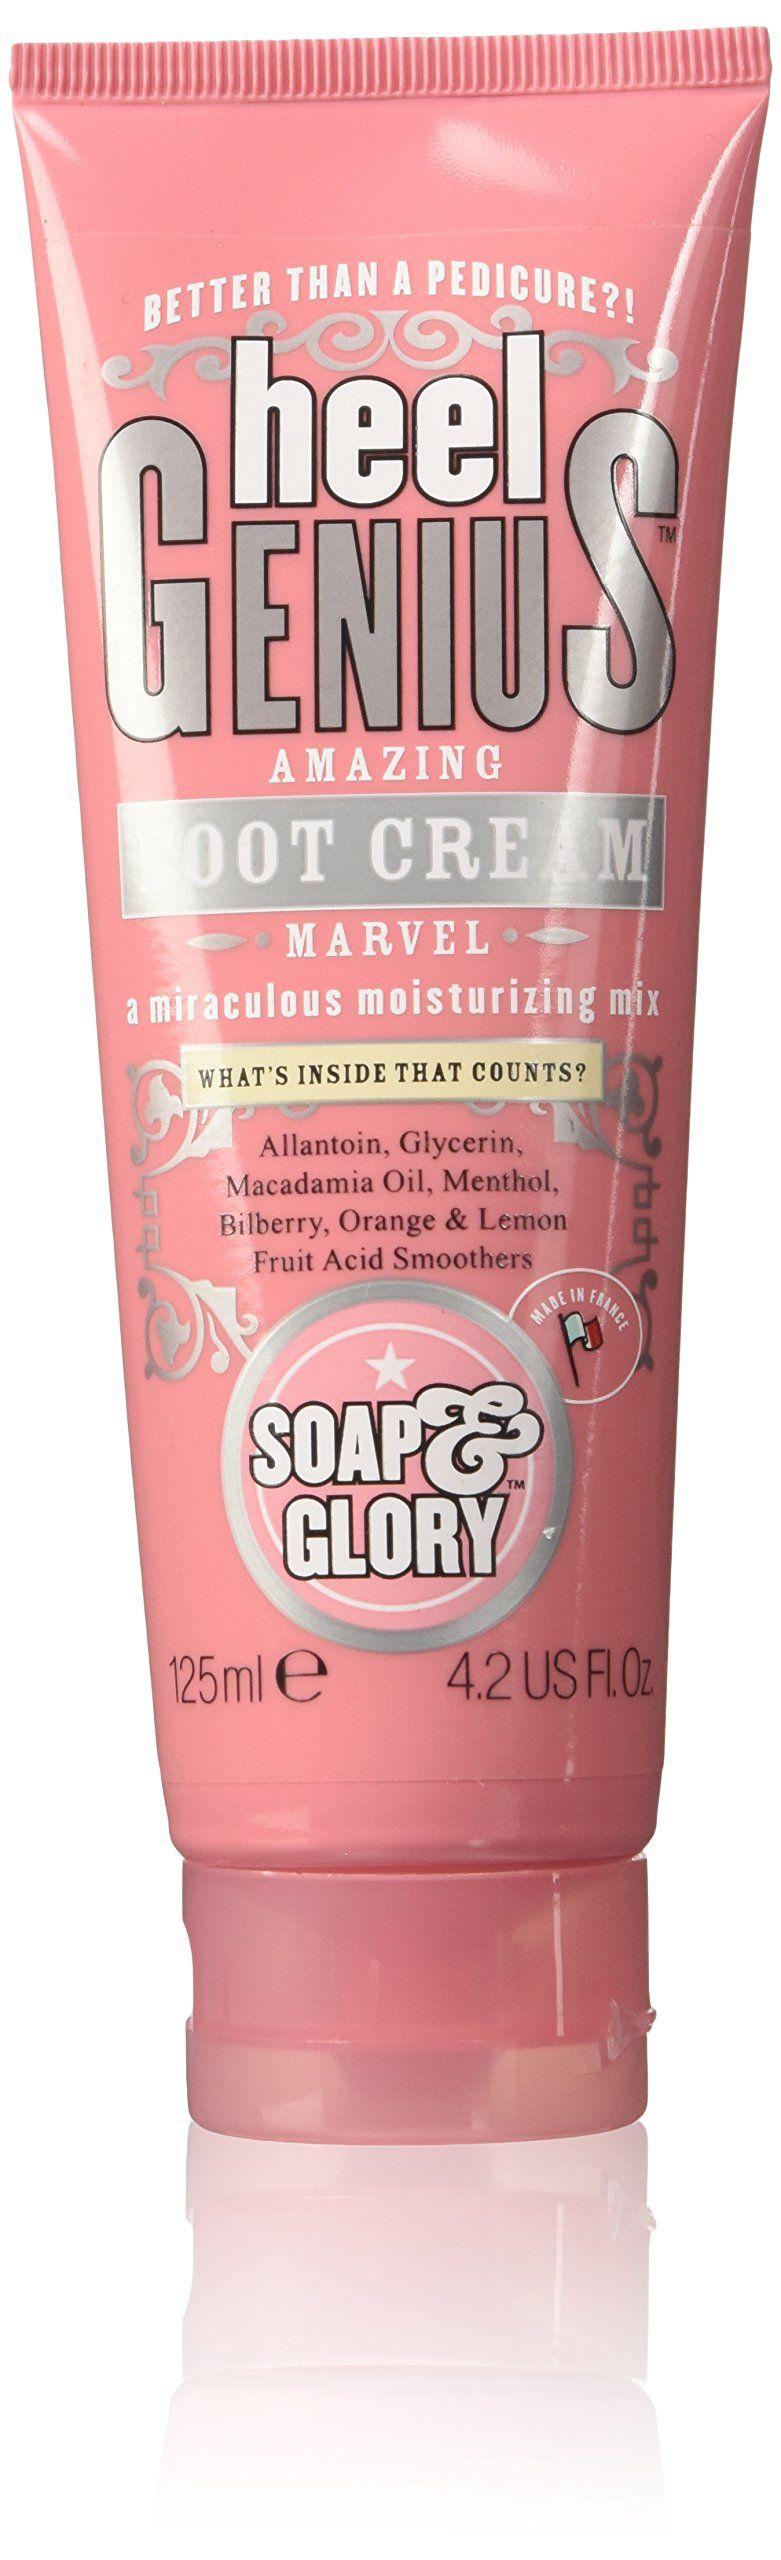 Soap & Glory Heel Genius 125ml Soap And